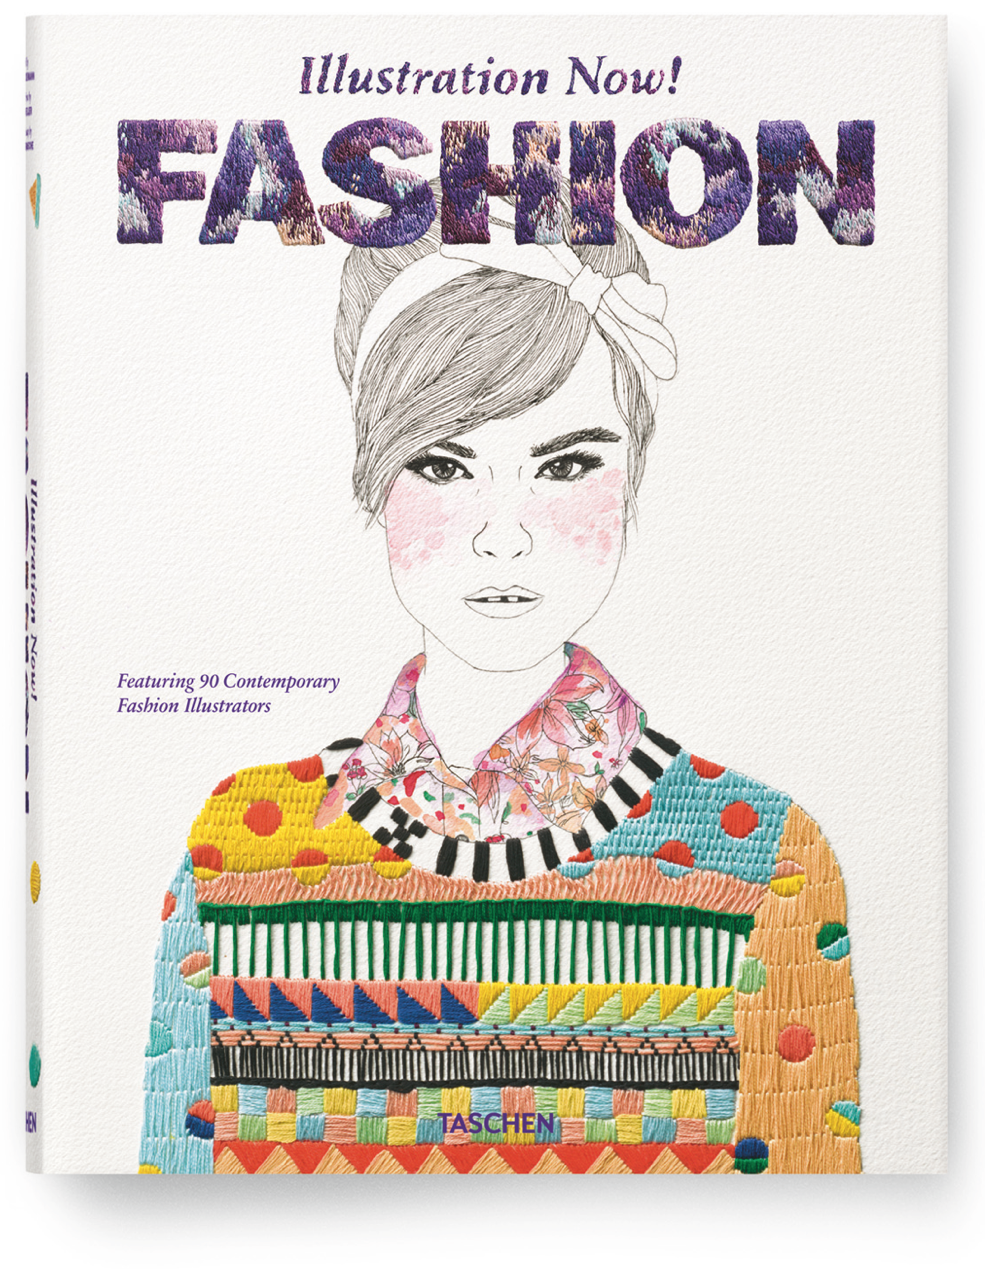 fashion illustration now book jarecz fashion illustration taschen illustration now fashion